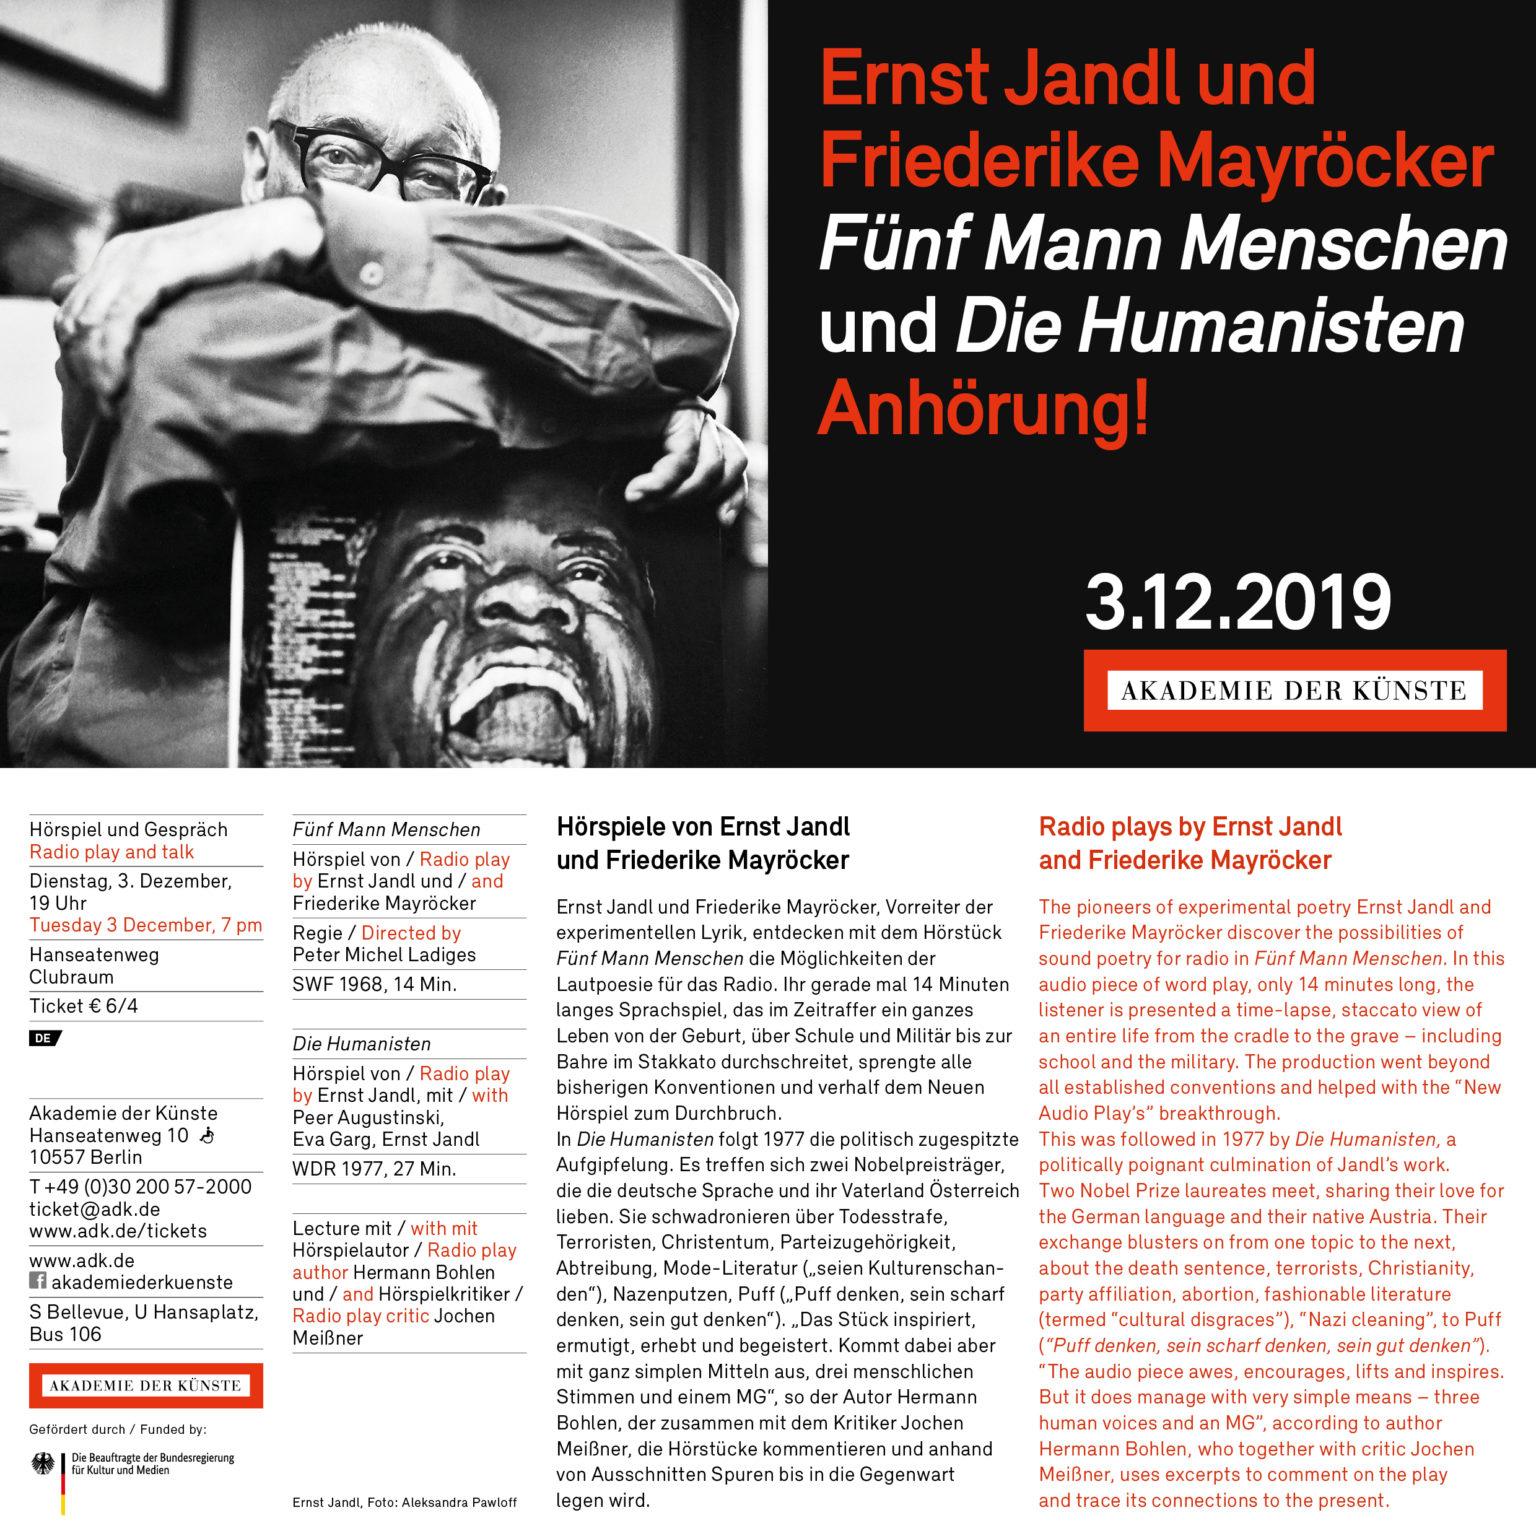 Anhörung! Jandl/Mayröcker